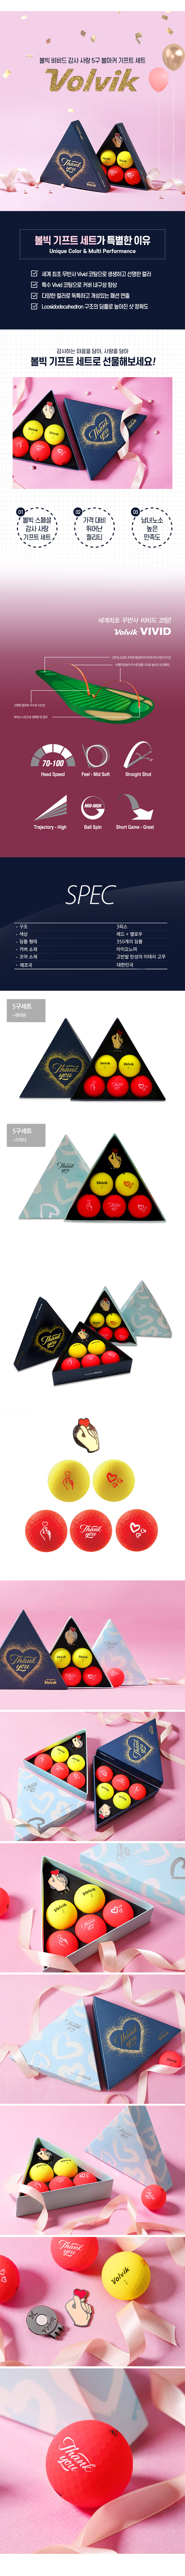 volvik_vivid_thanks_5balls_gift_set_20.jpg